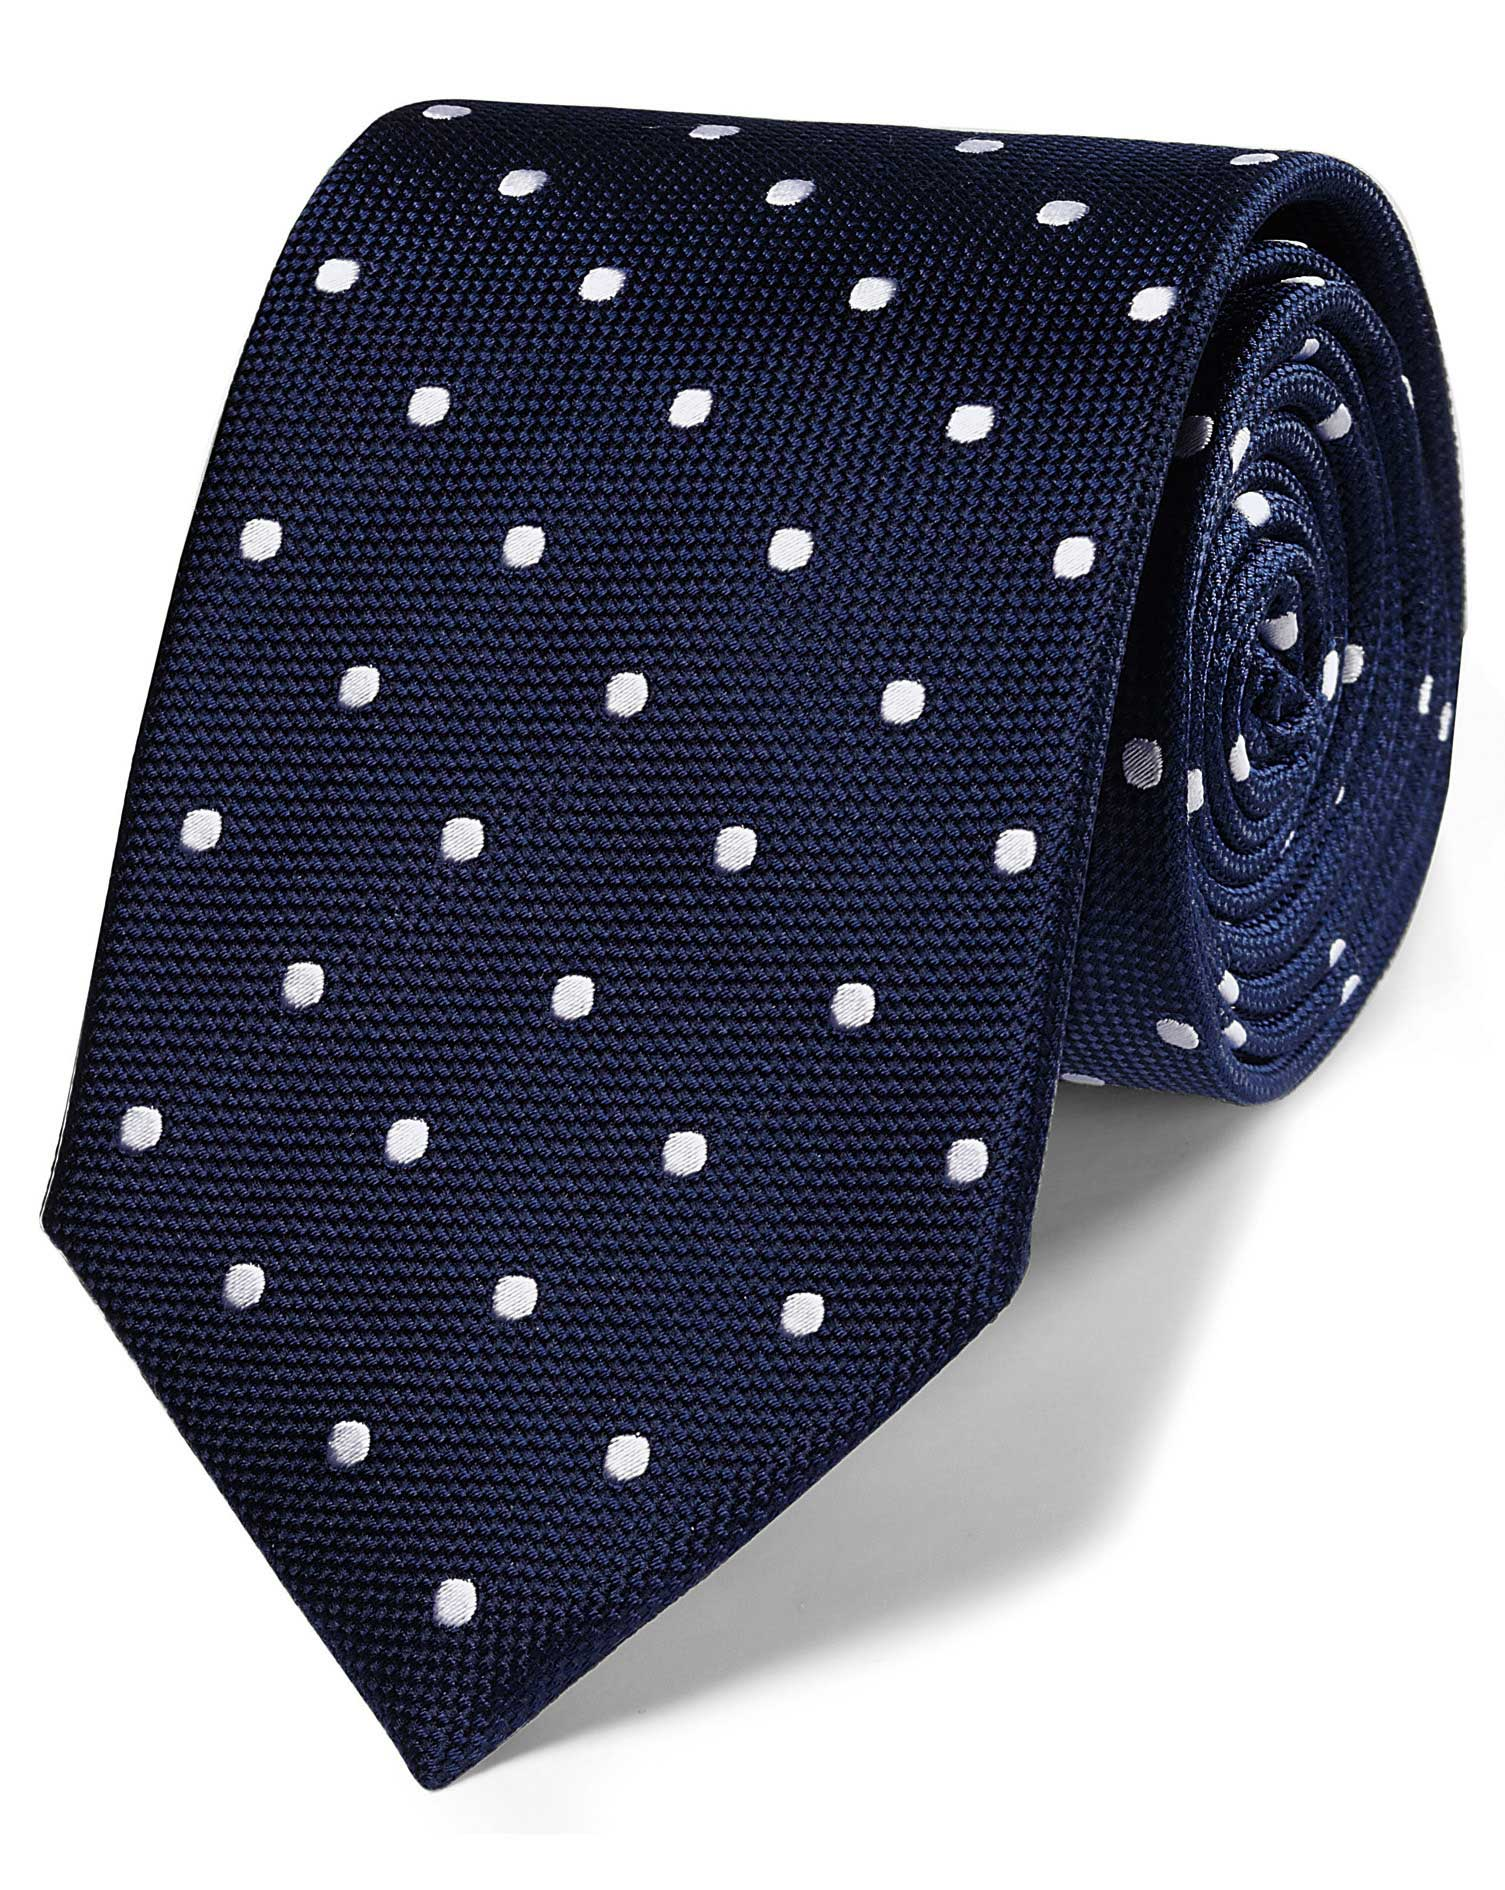 Navy silk spot classic tie charles tyrwhitt navy silk spot classic tie ccuart Image collections